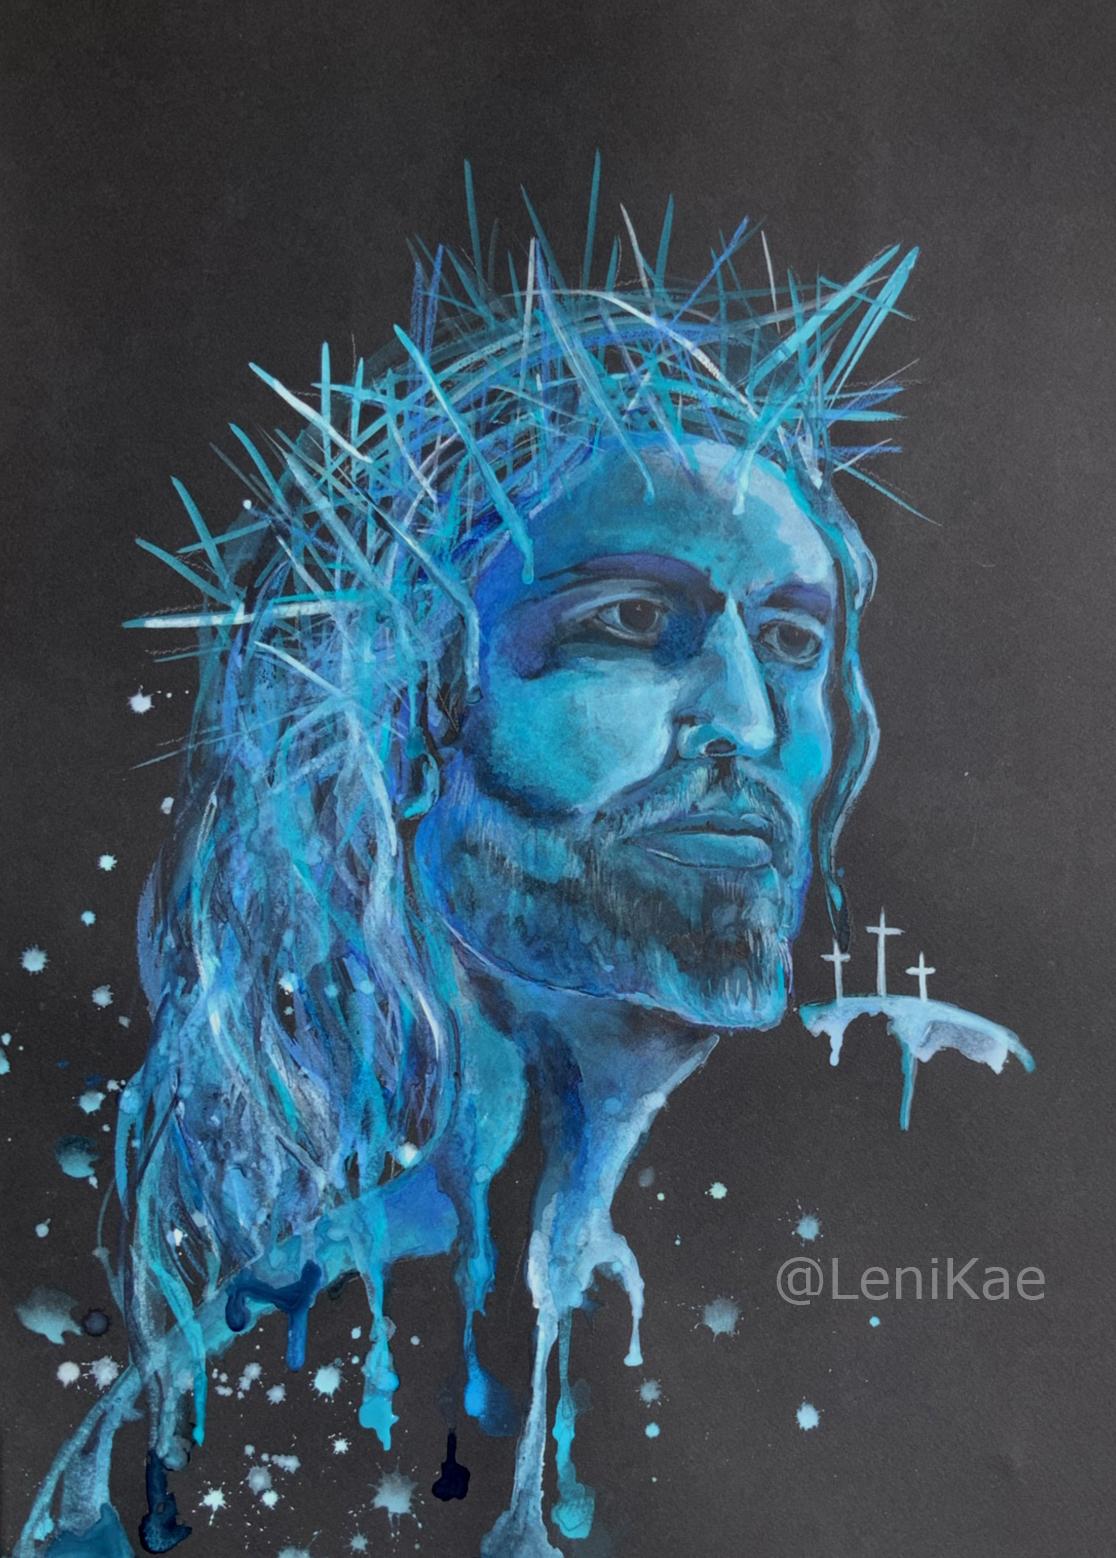 Artist Leni Kae Jesus Modern Art Painting Www.lenikae.com.au